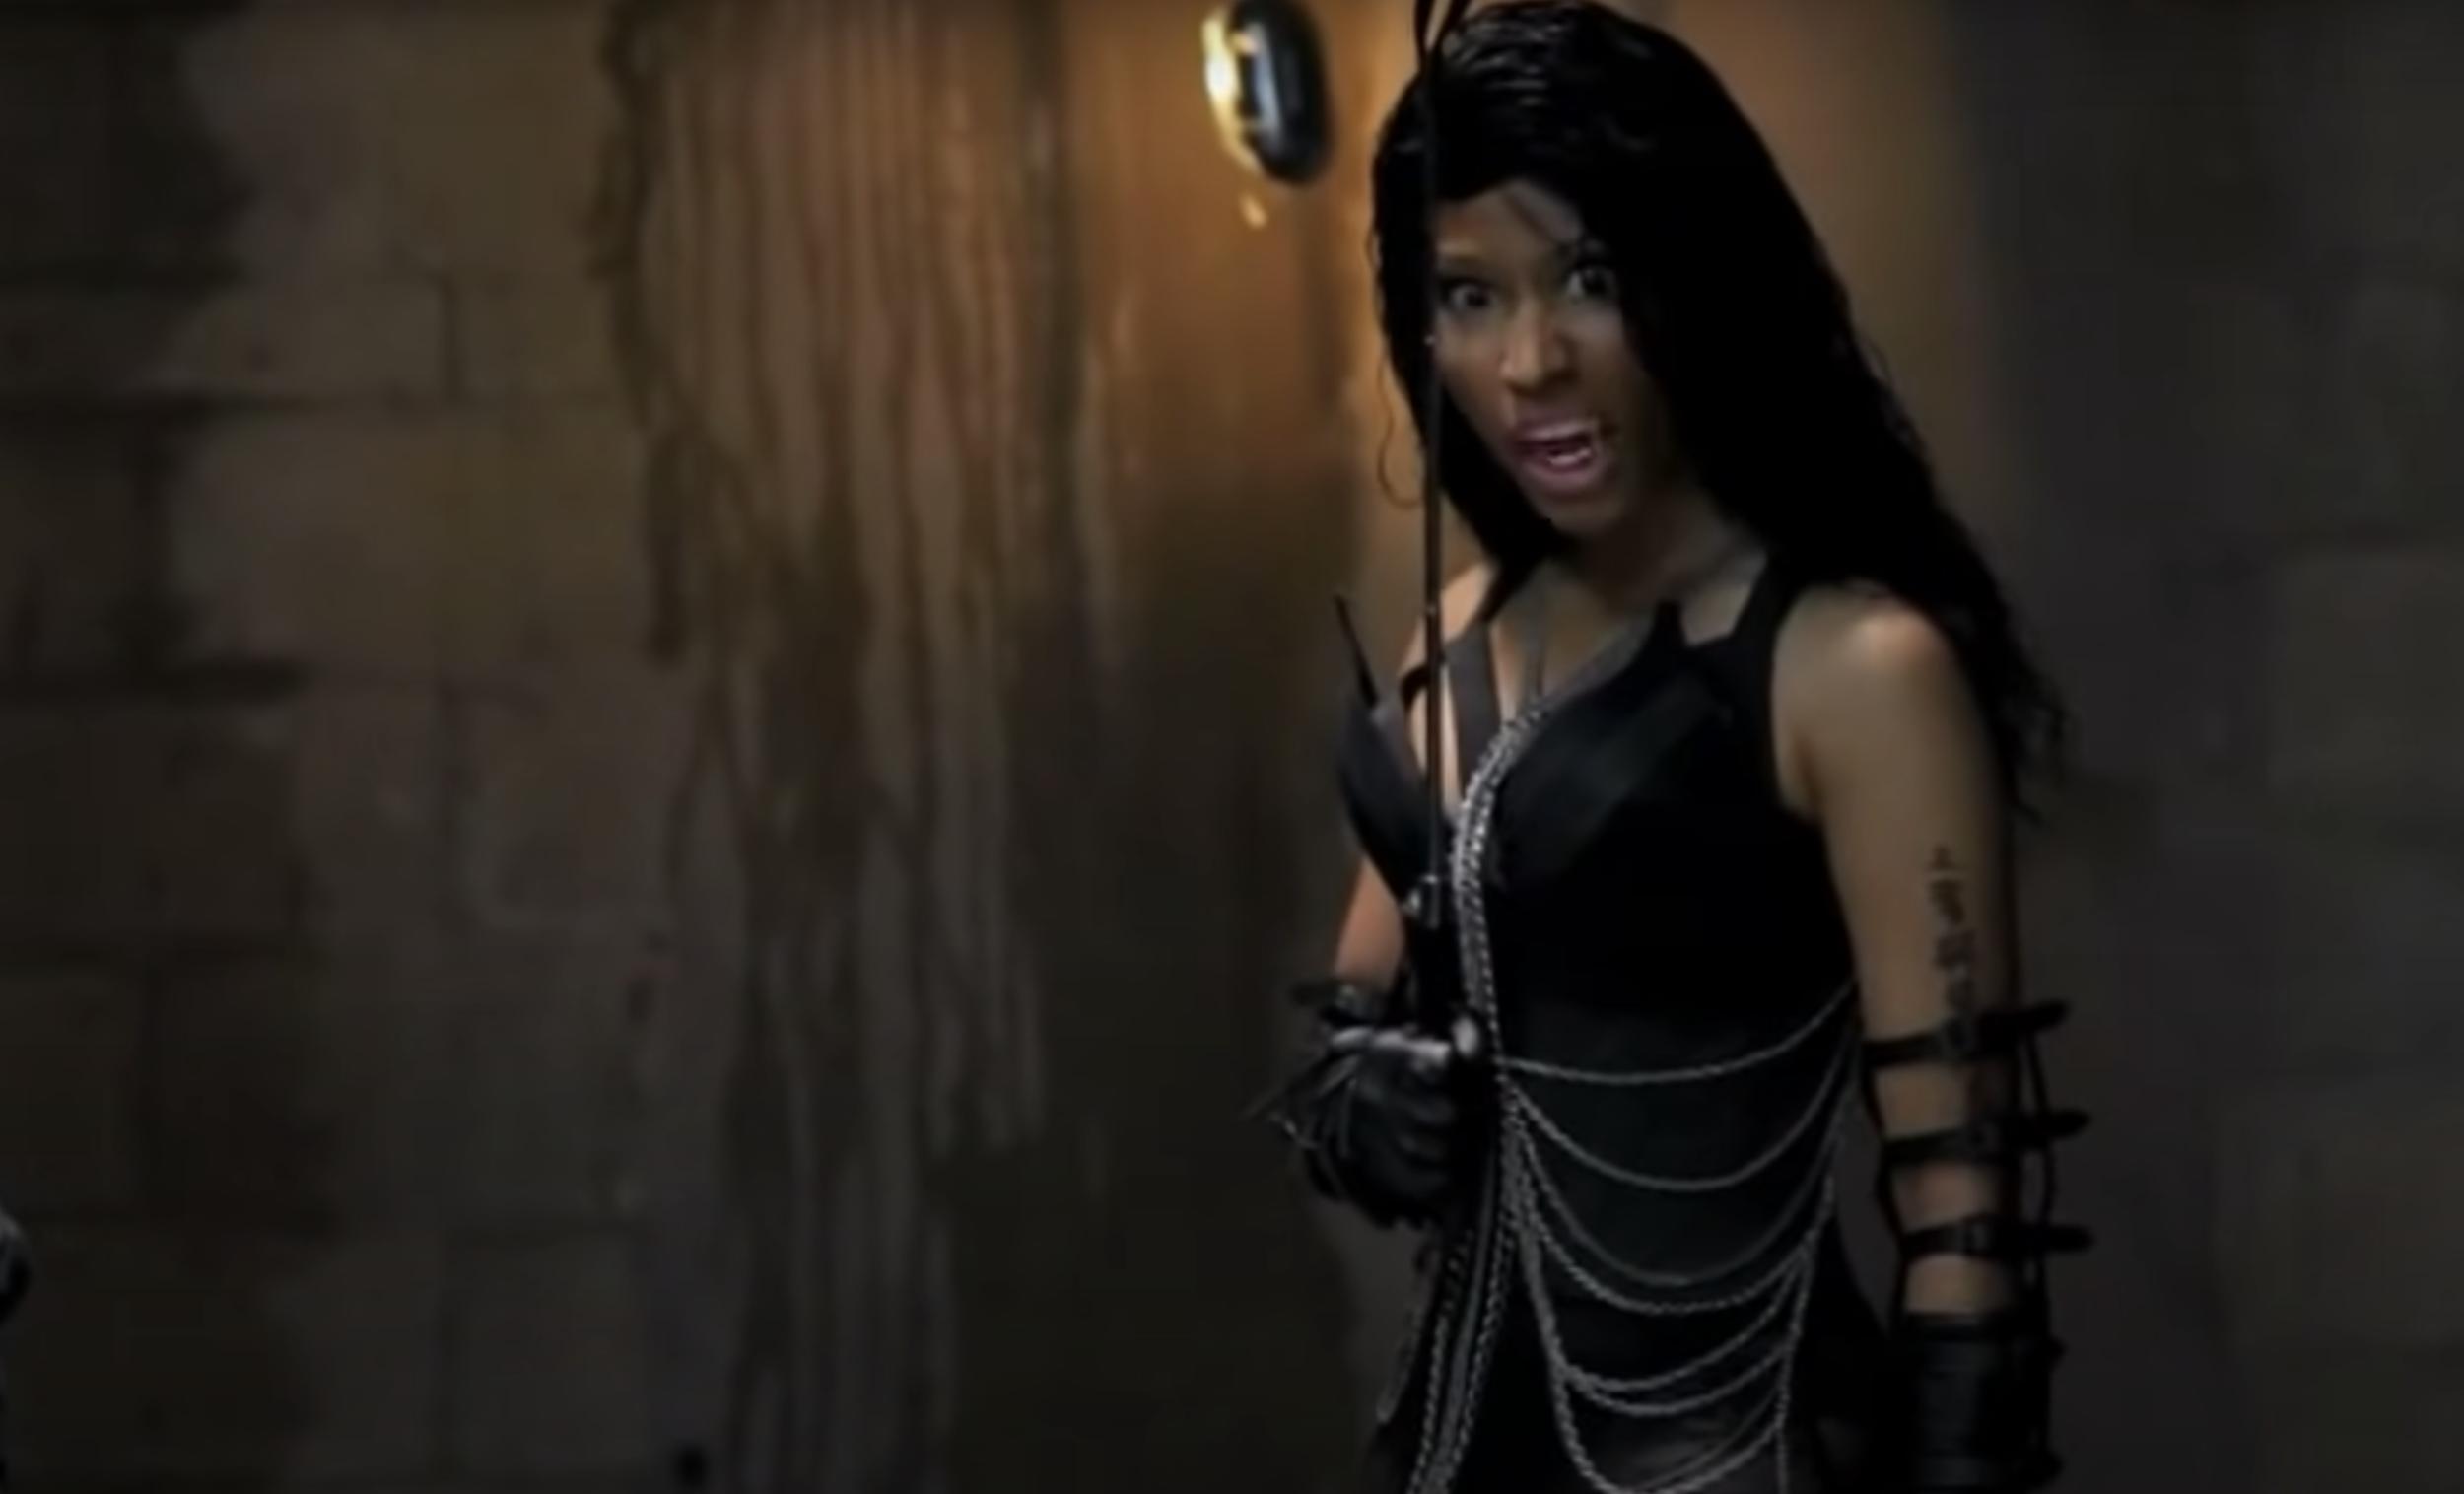 Nicki Minaj acting like a monster in the music video